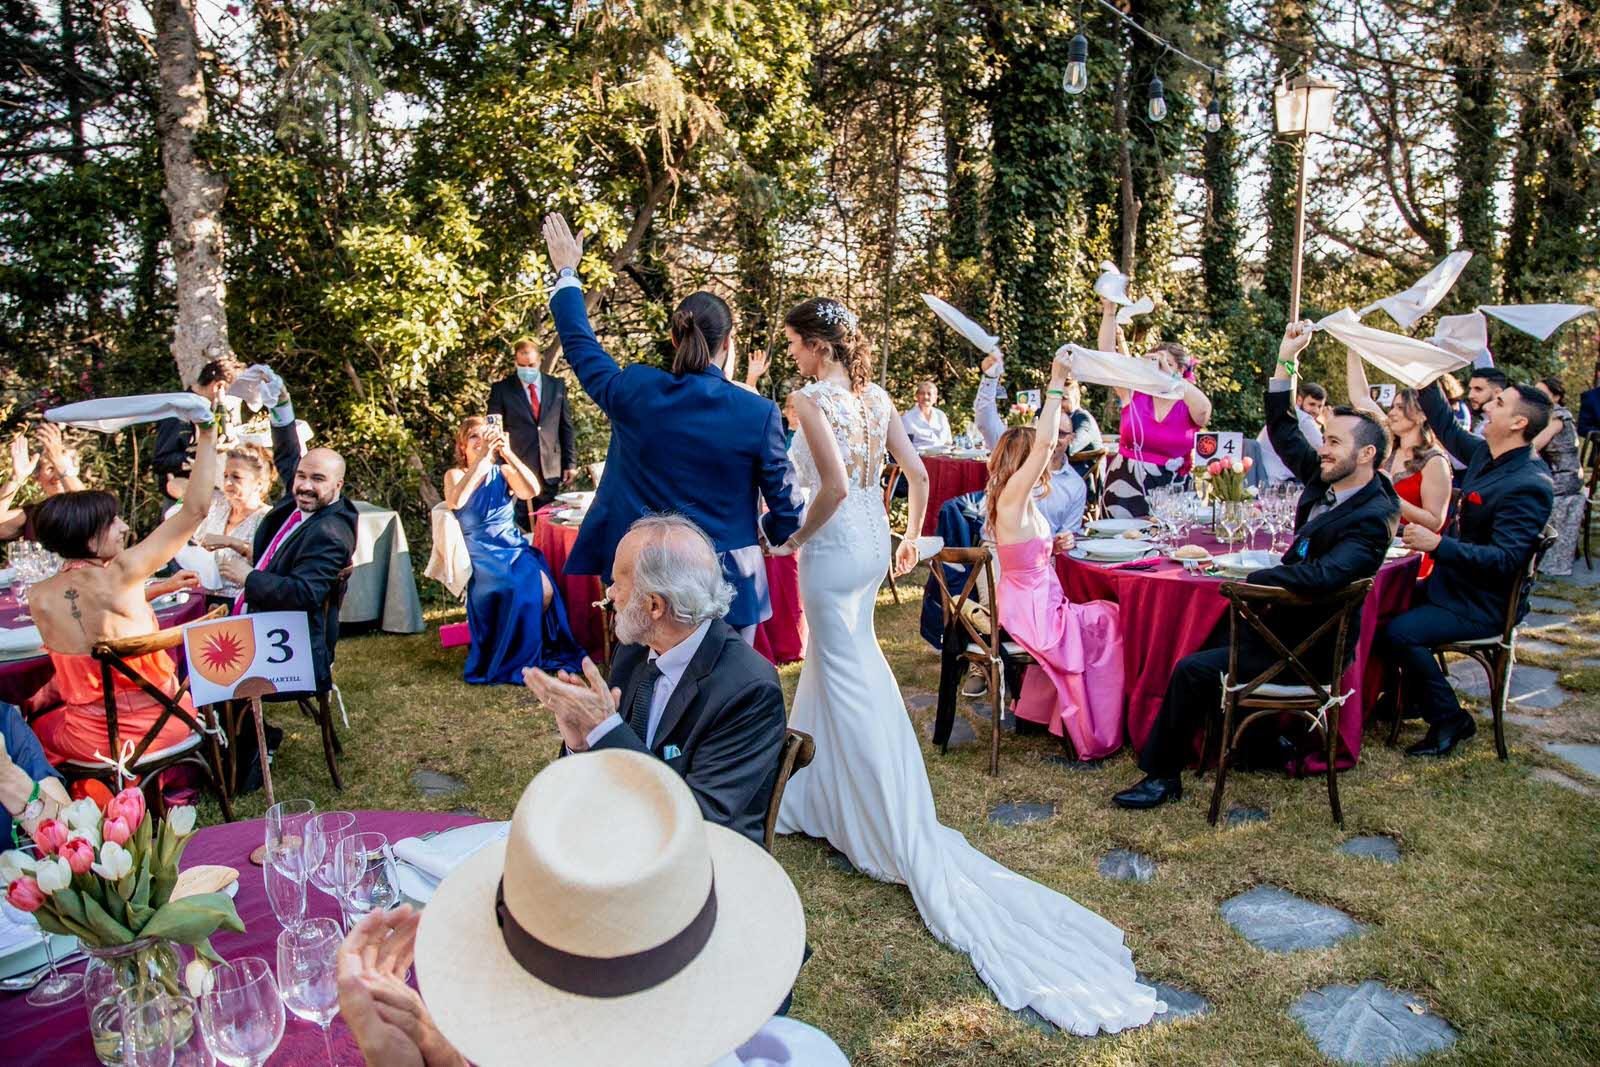 llegada de los novios en el banquete Finca Etxemendi-Etxondo